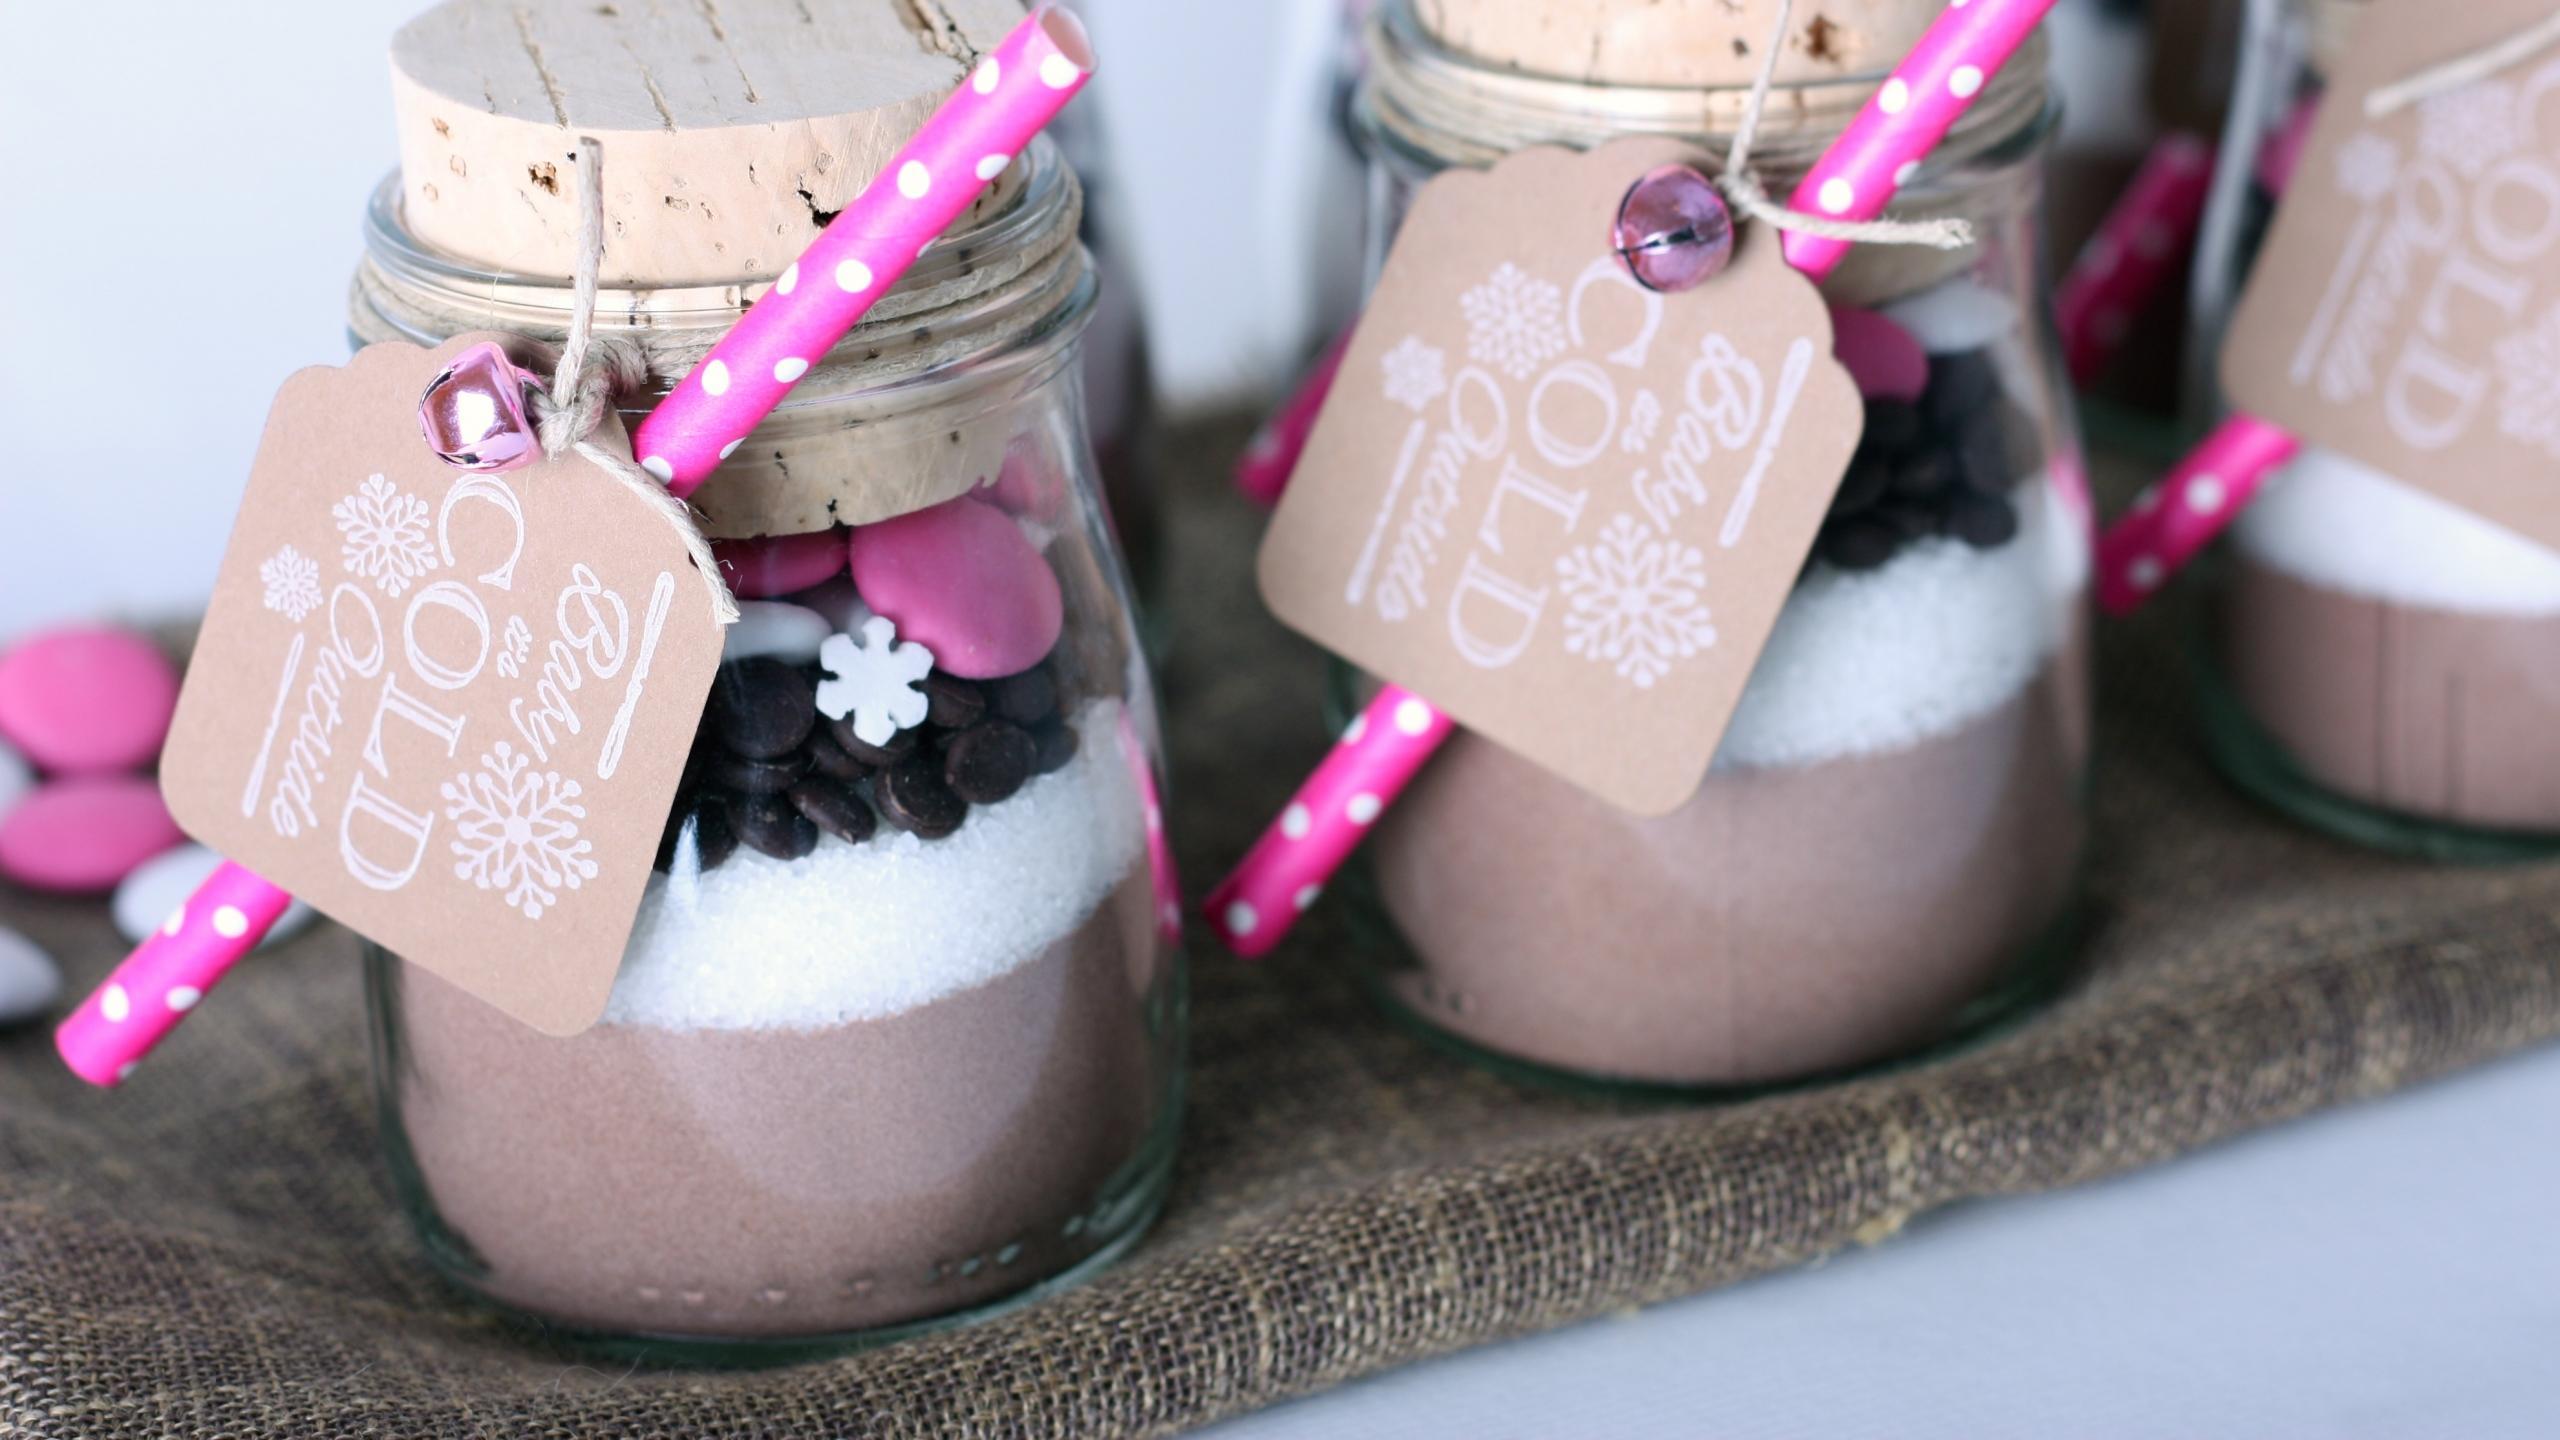 обои десерт, йогурт, шоколад, конфеты картинки фото